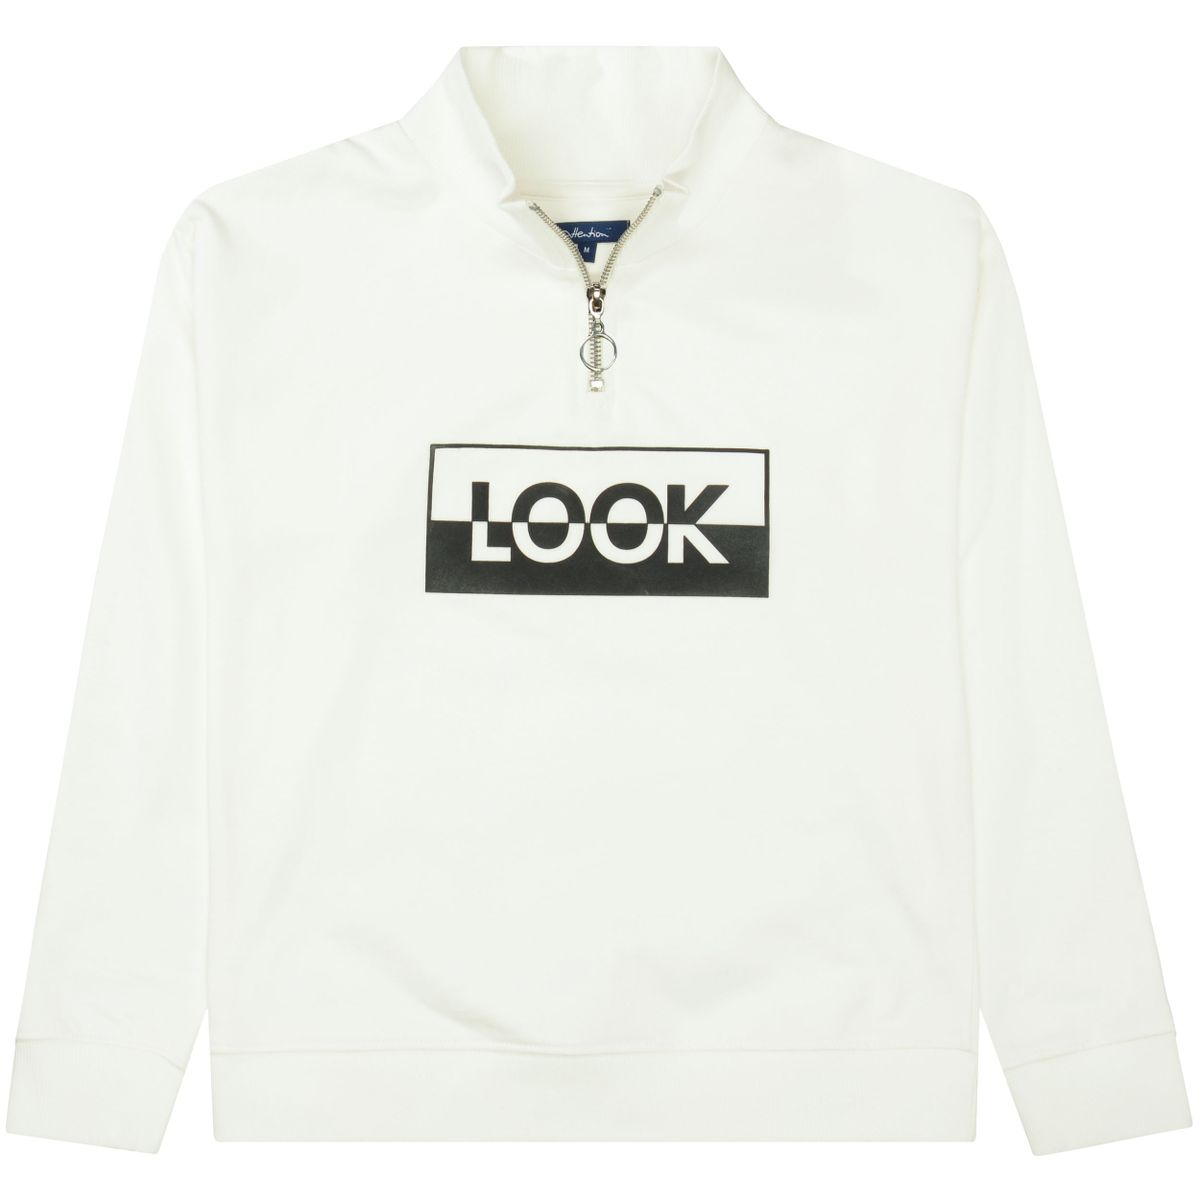 ATTENTION Sweatshirt LOOK - Offwhite